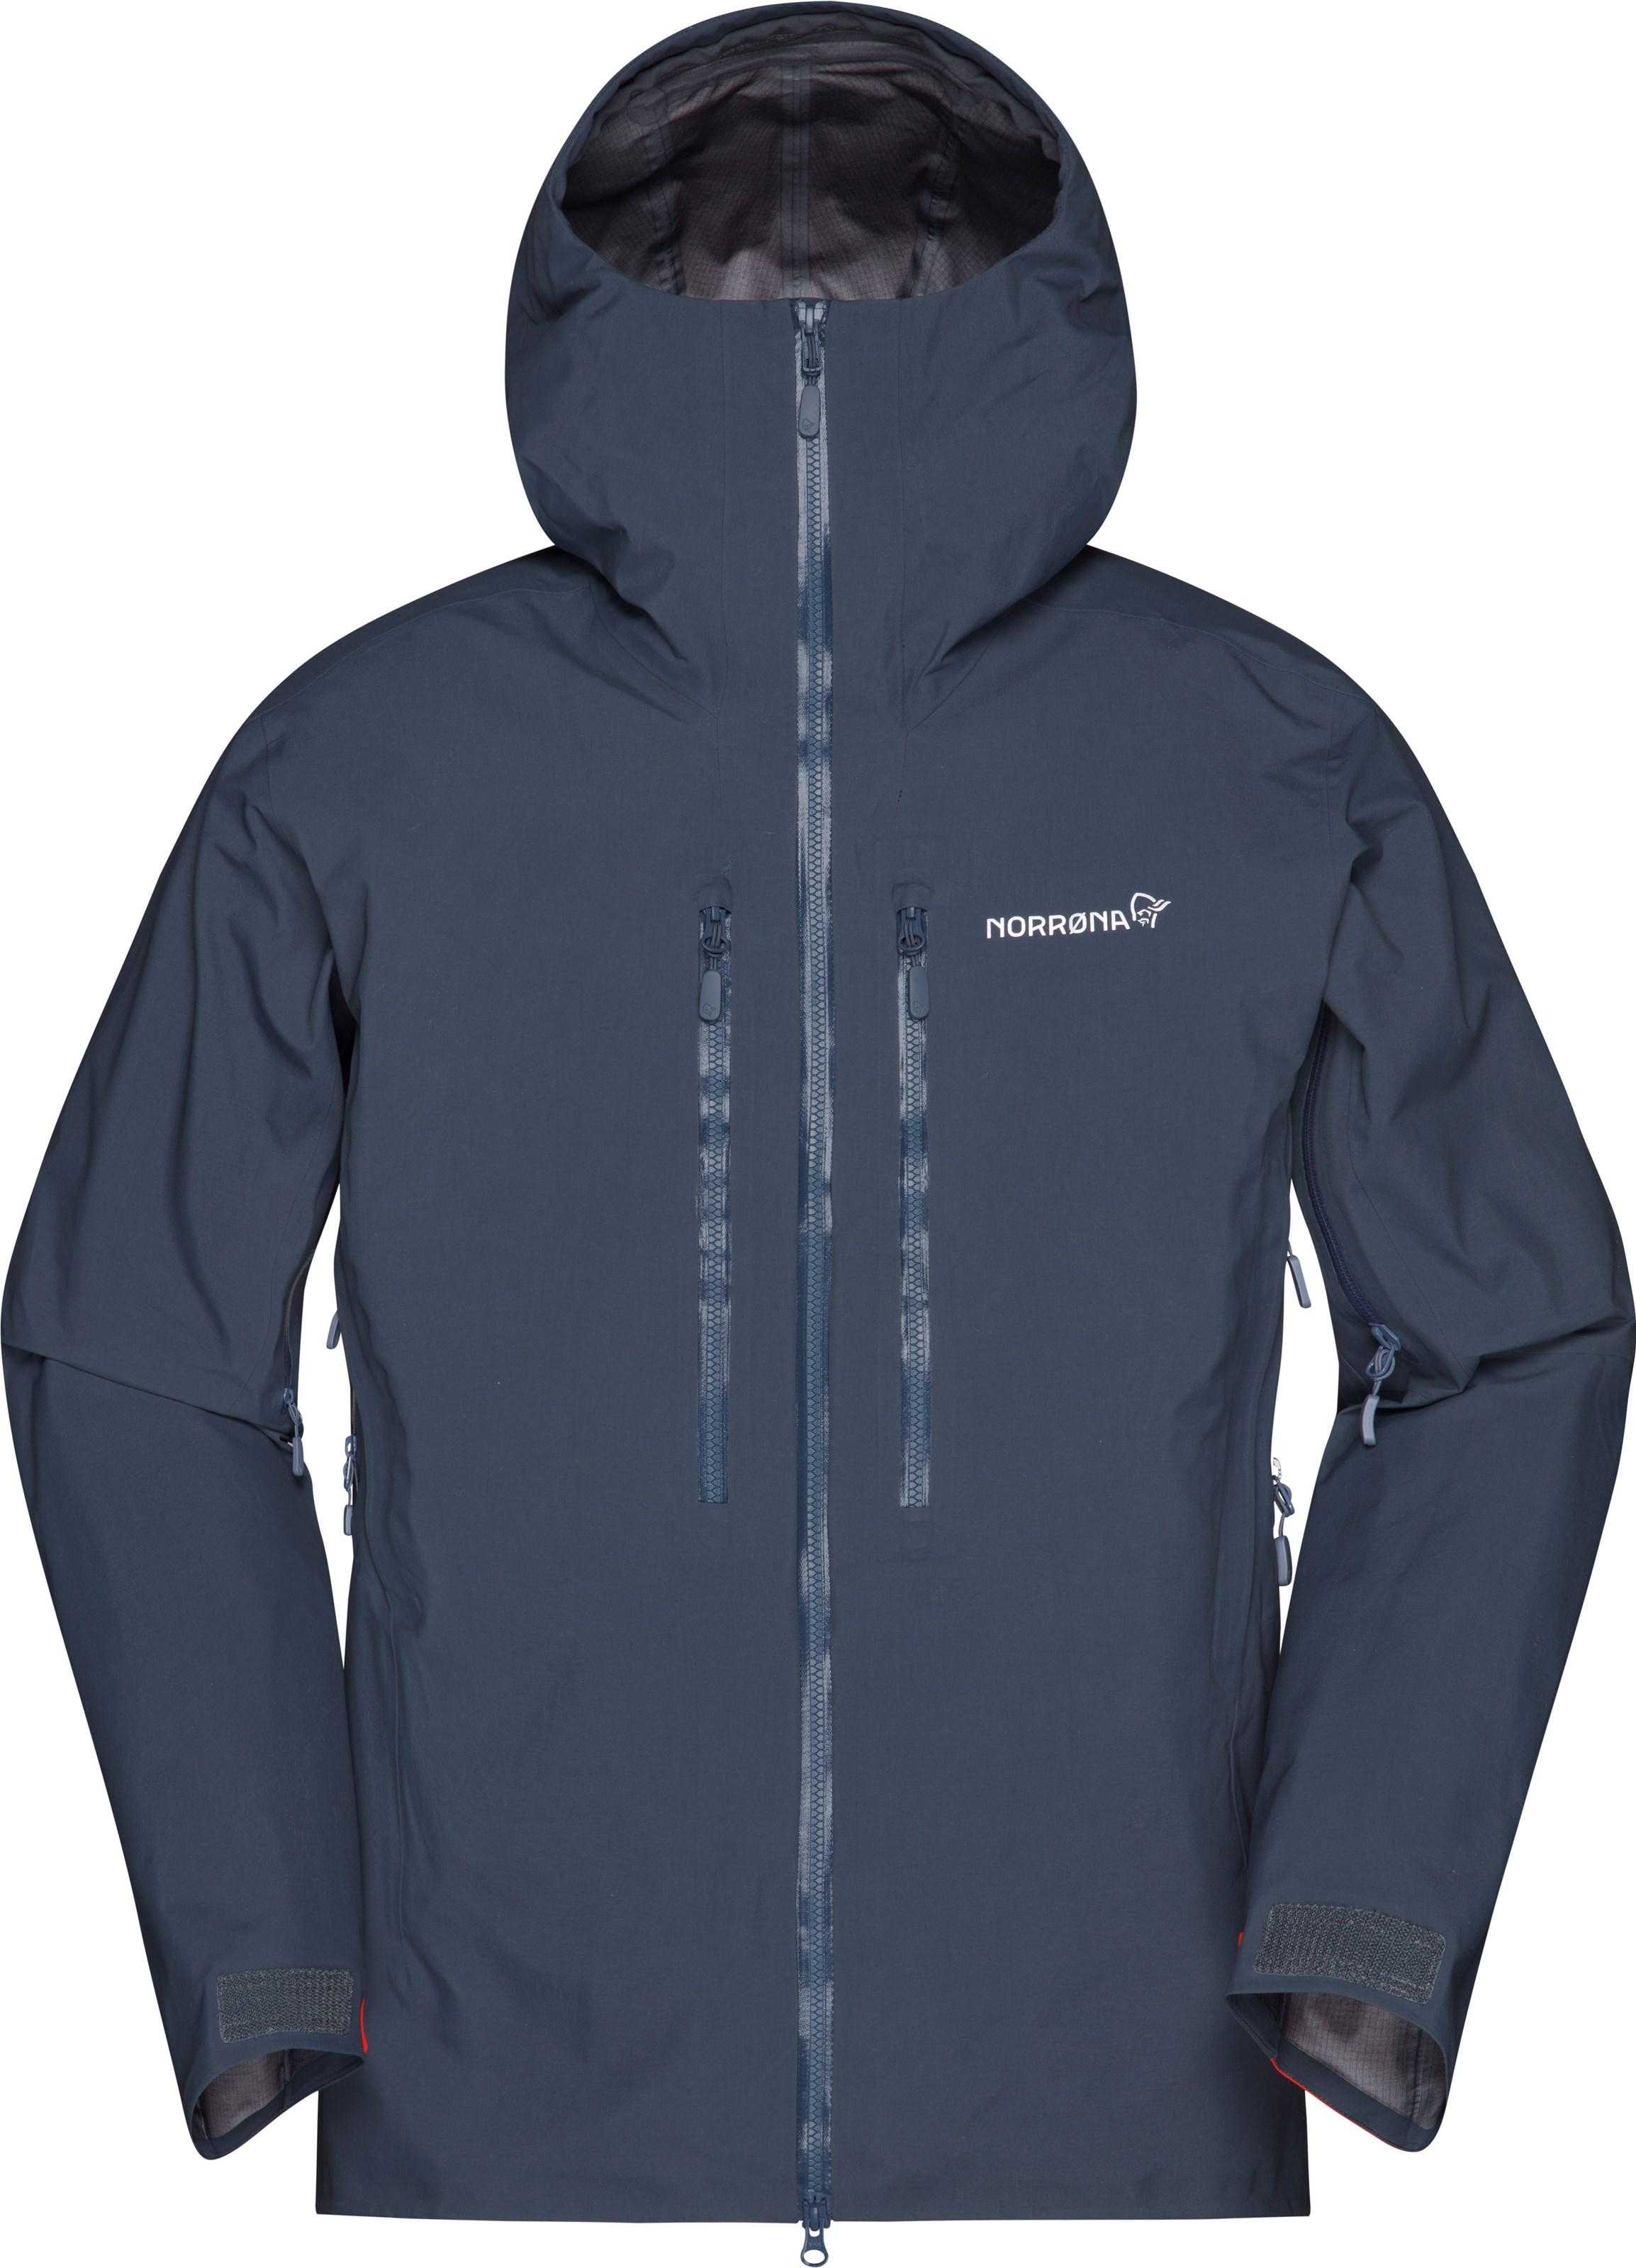 Norrøna jakke herre | Dunjakke til herre. 2020 09 13